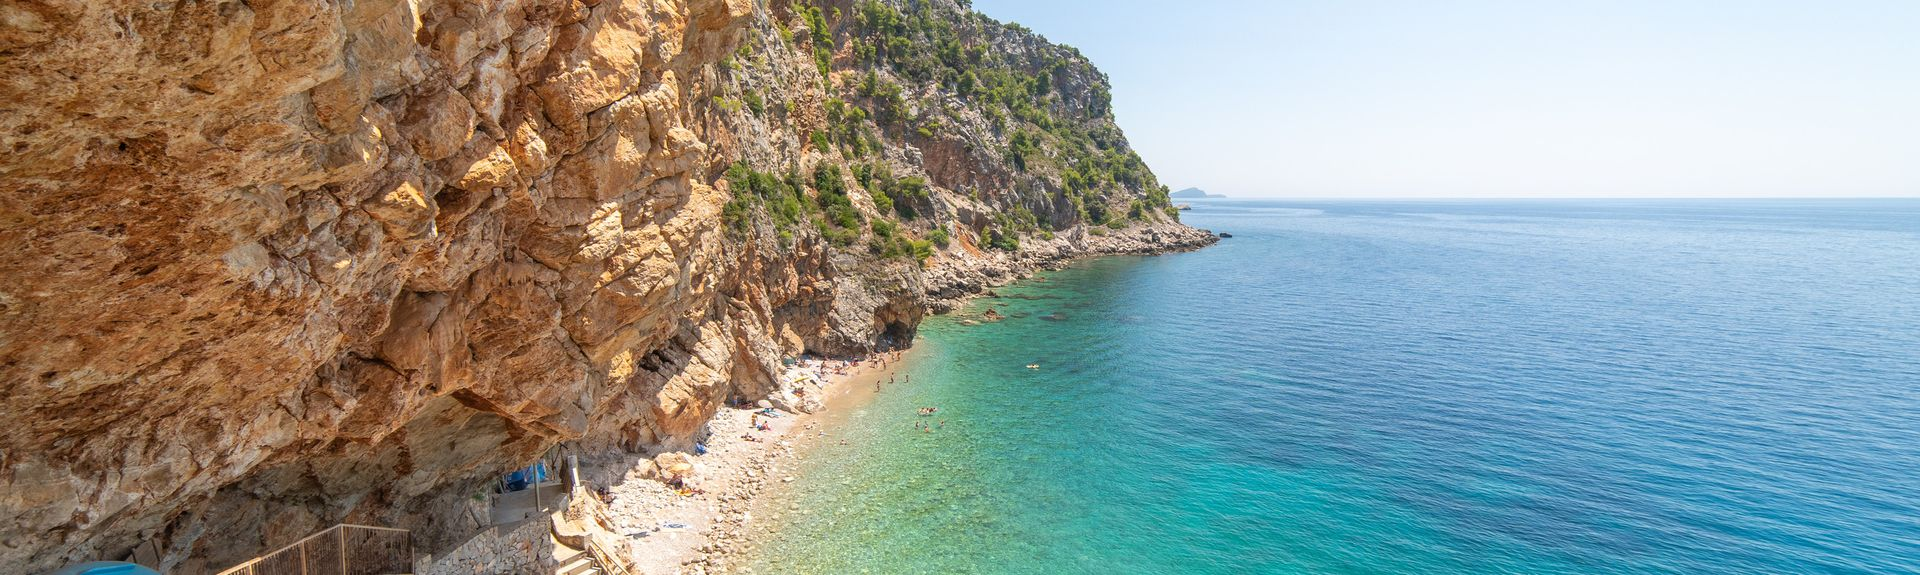 Comitat de Dubrovnik-Neretva, Croatie